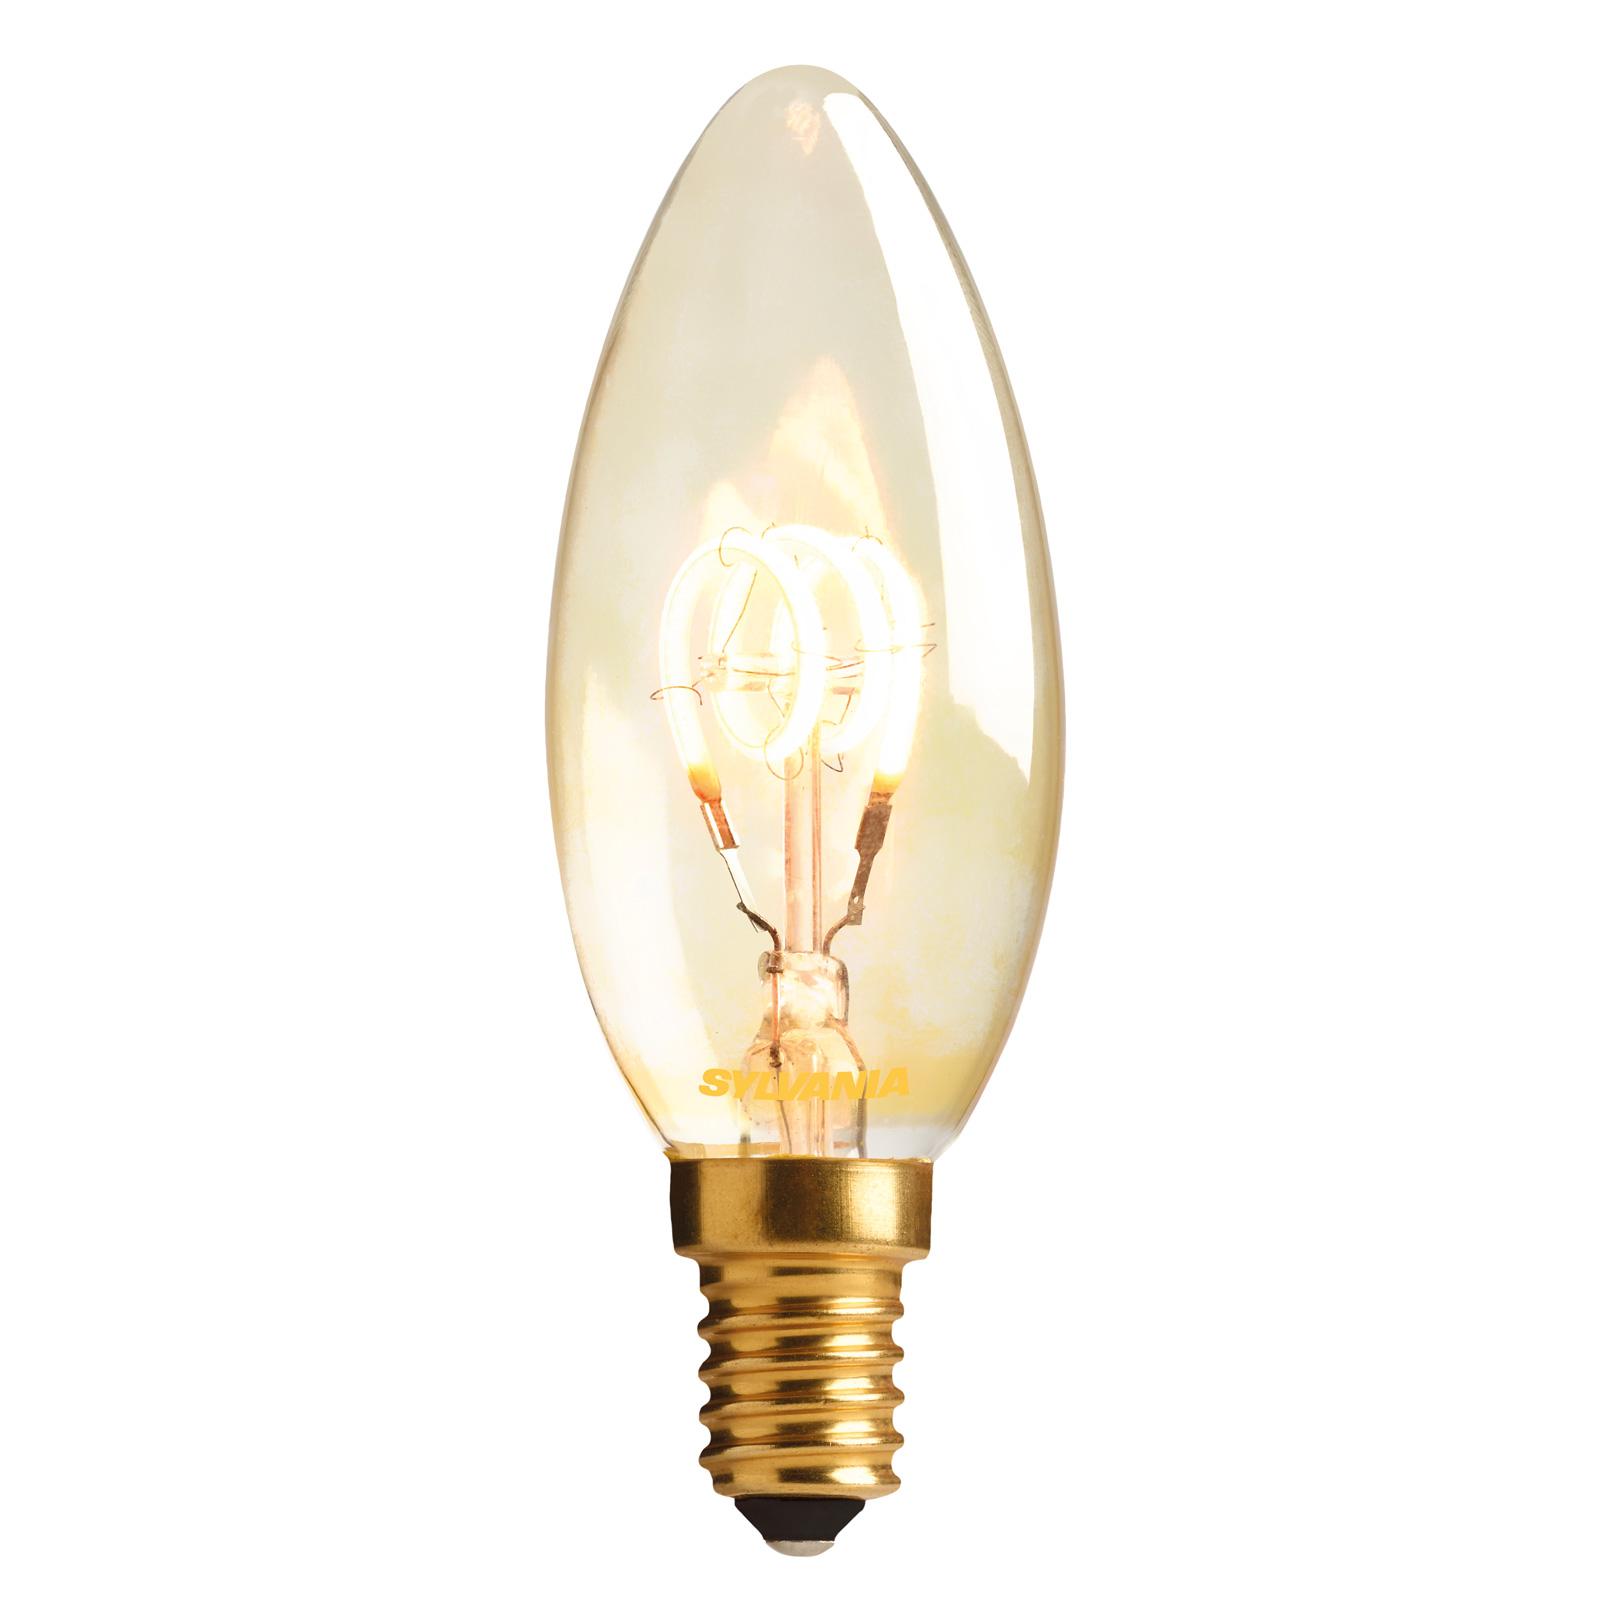 ToLEDo Vintage LED-kertepære E14 820 2,3W, guld